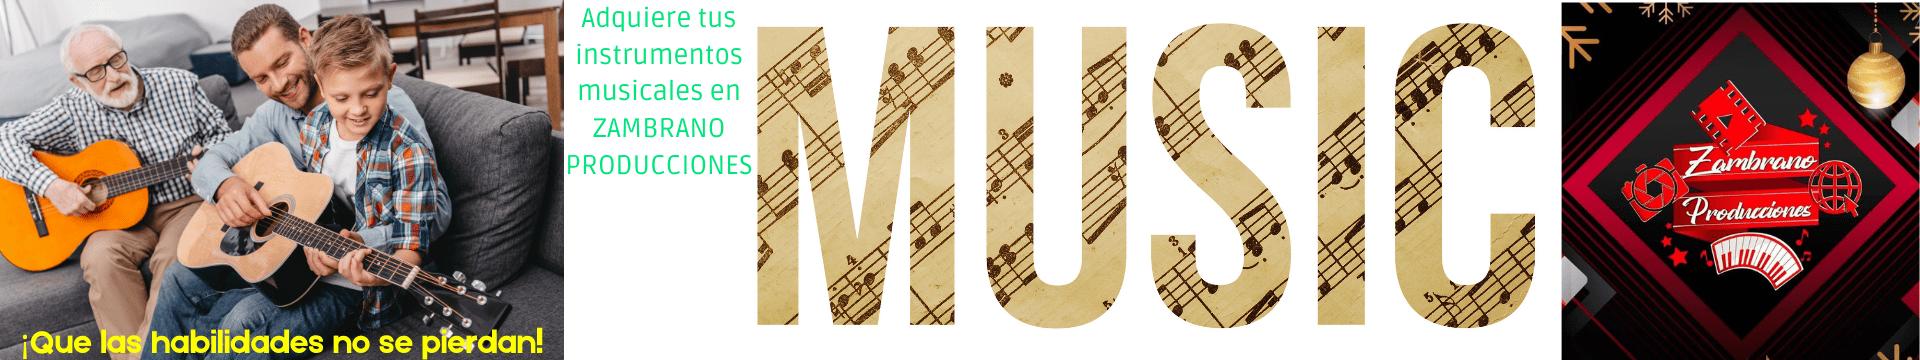 banner image m-0